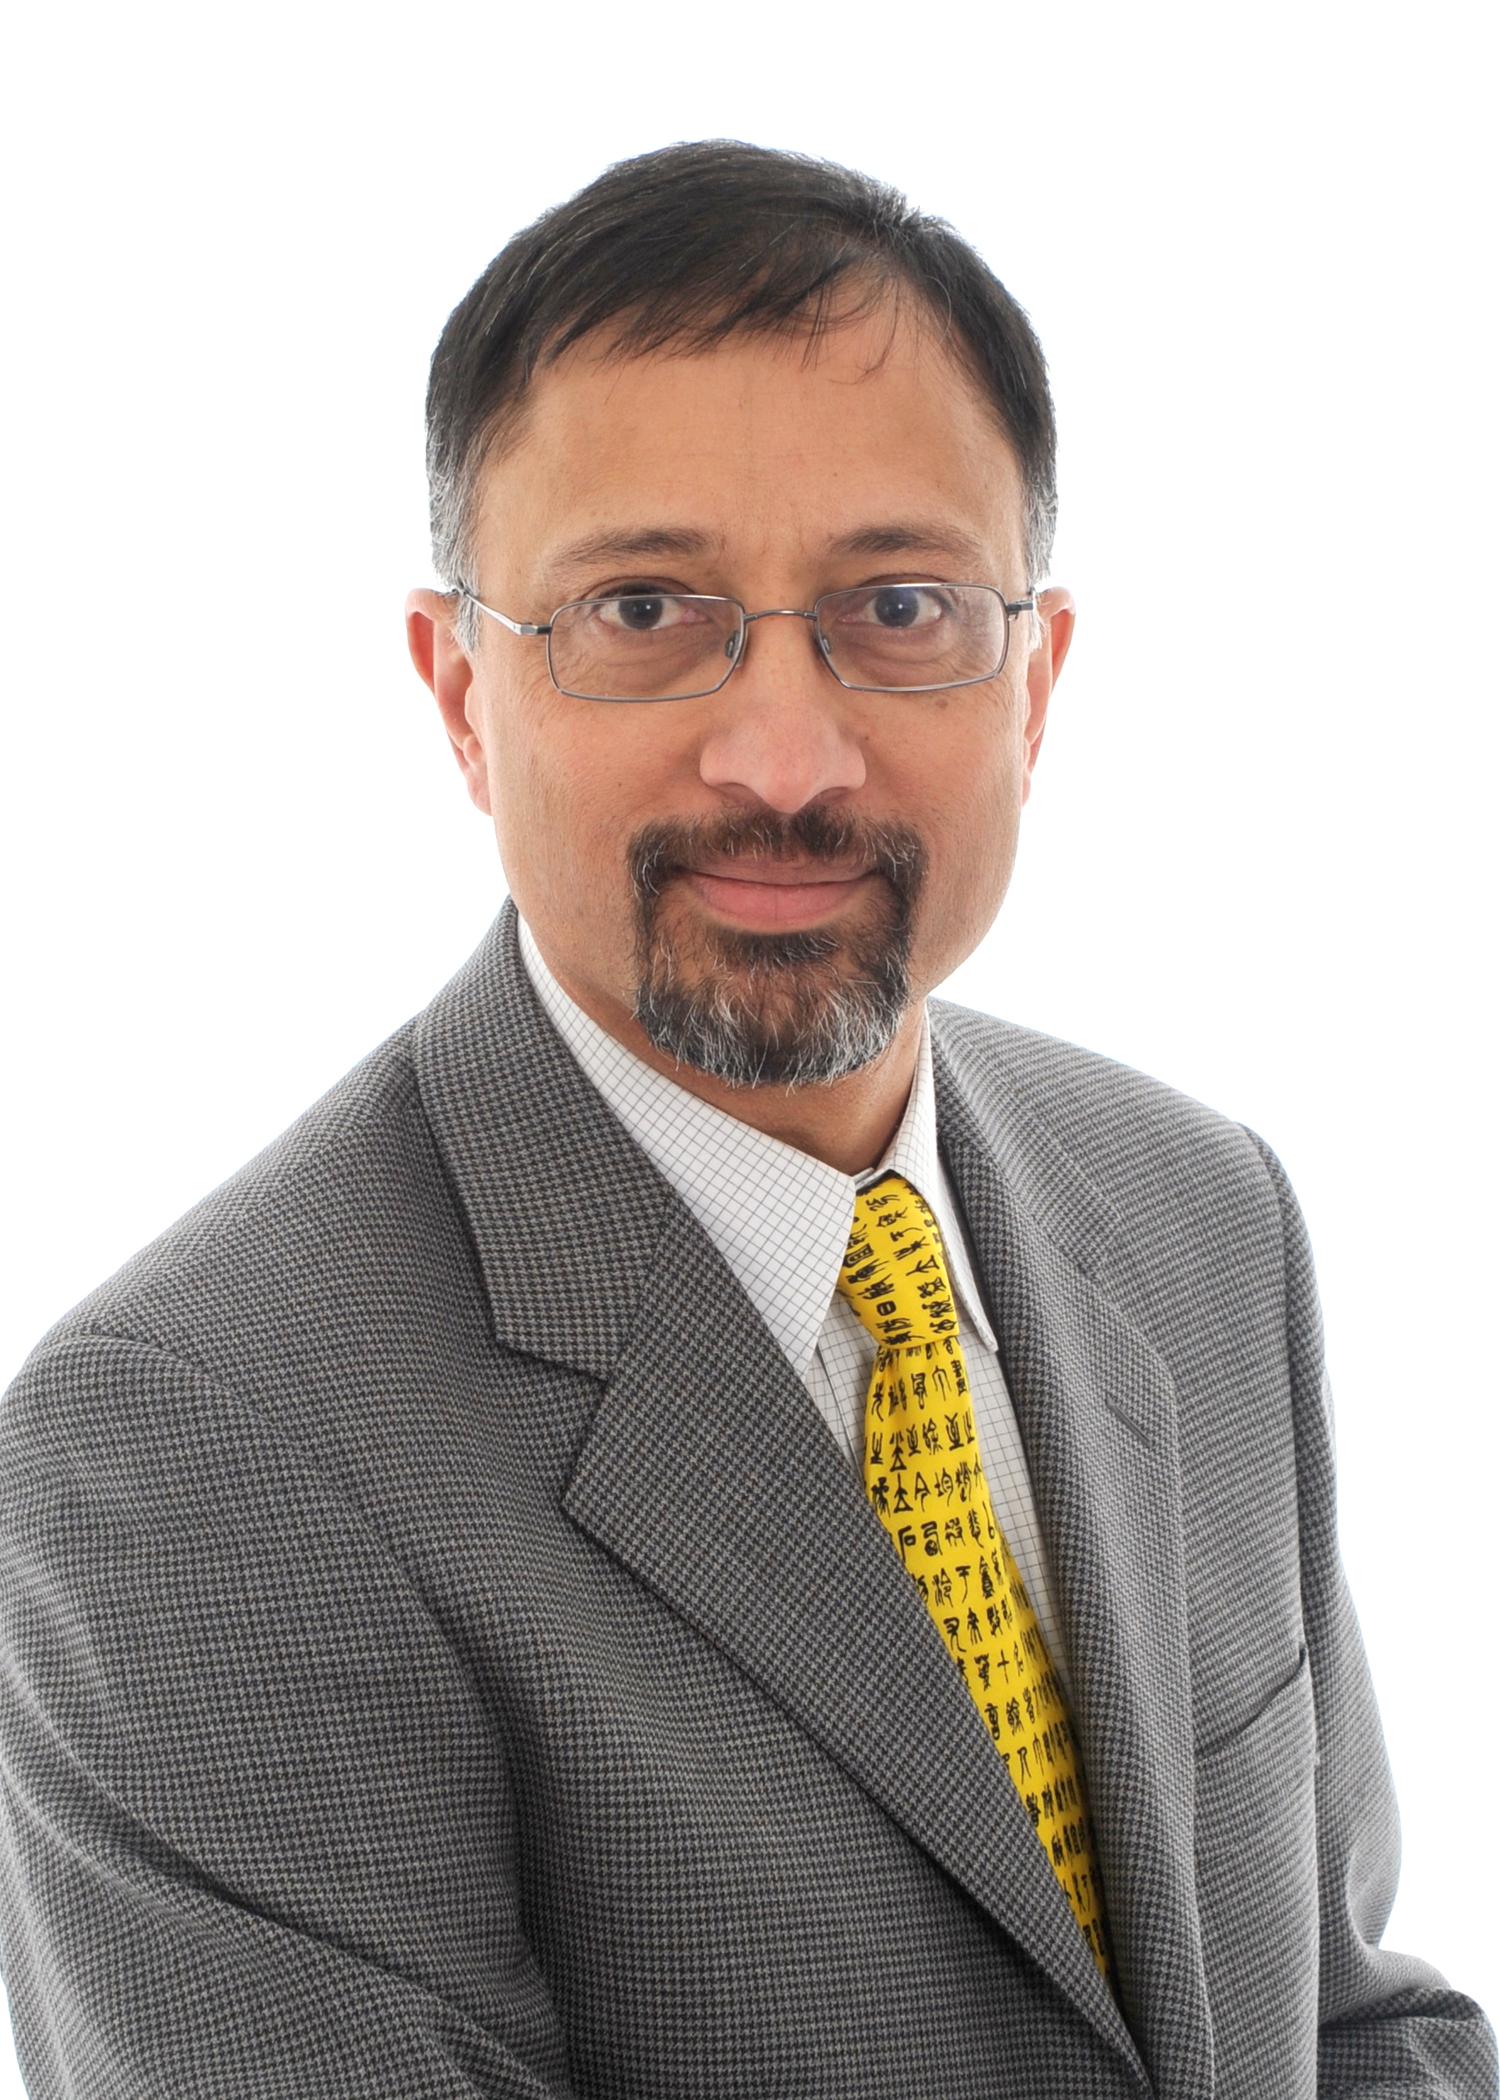 Dr. Mehul Mehta, President of Team MI